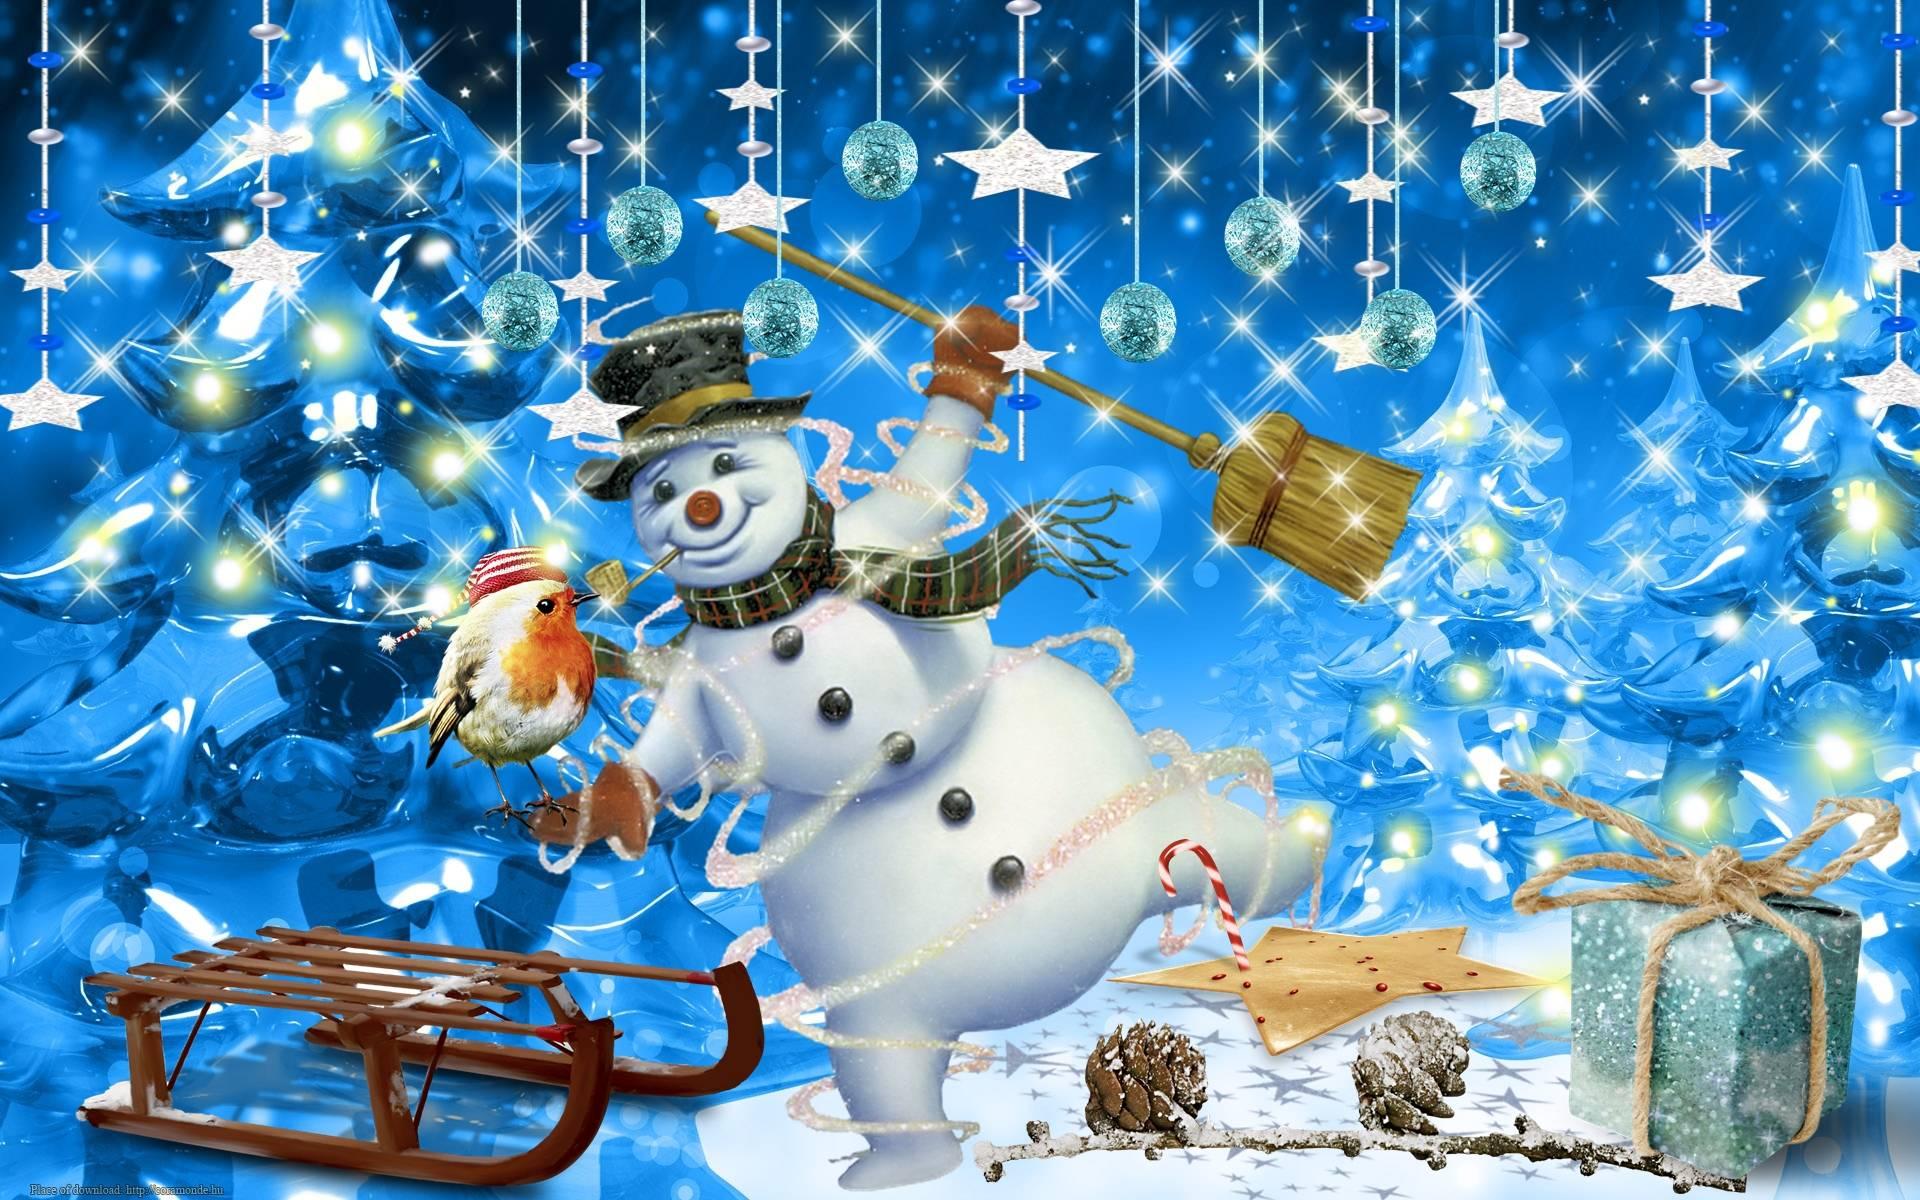 Frosty The Snowman Wallpaper Desktop